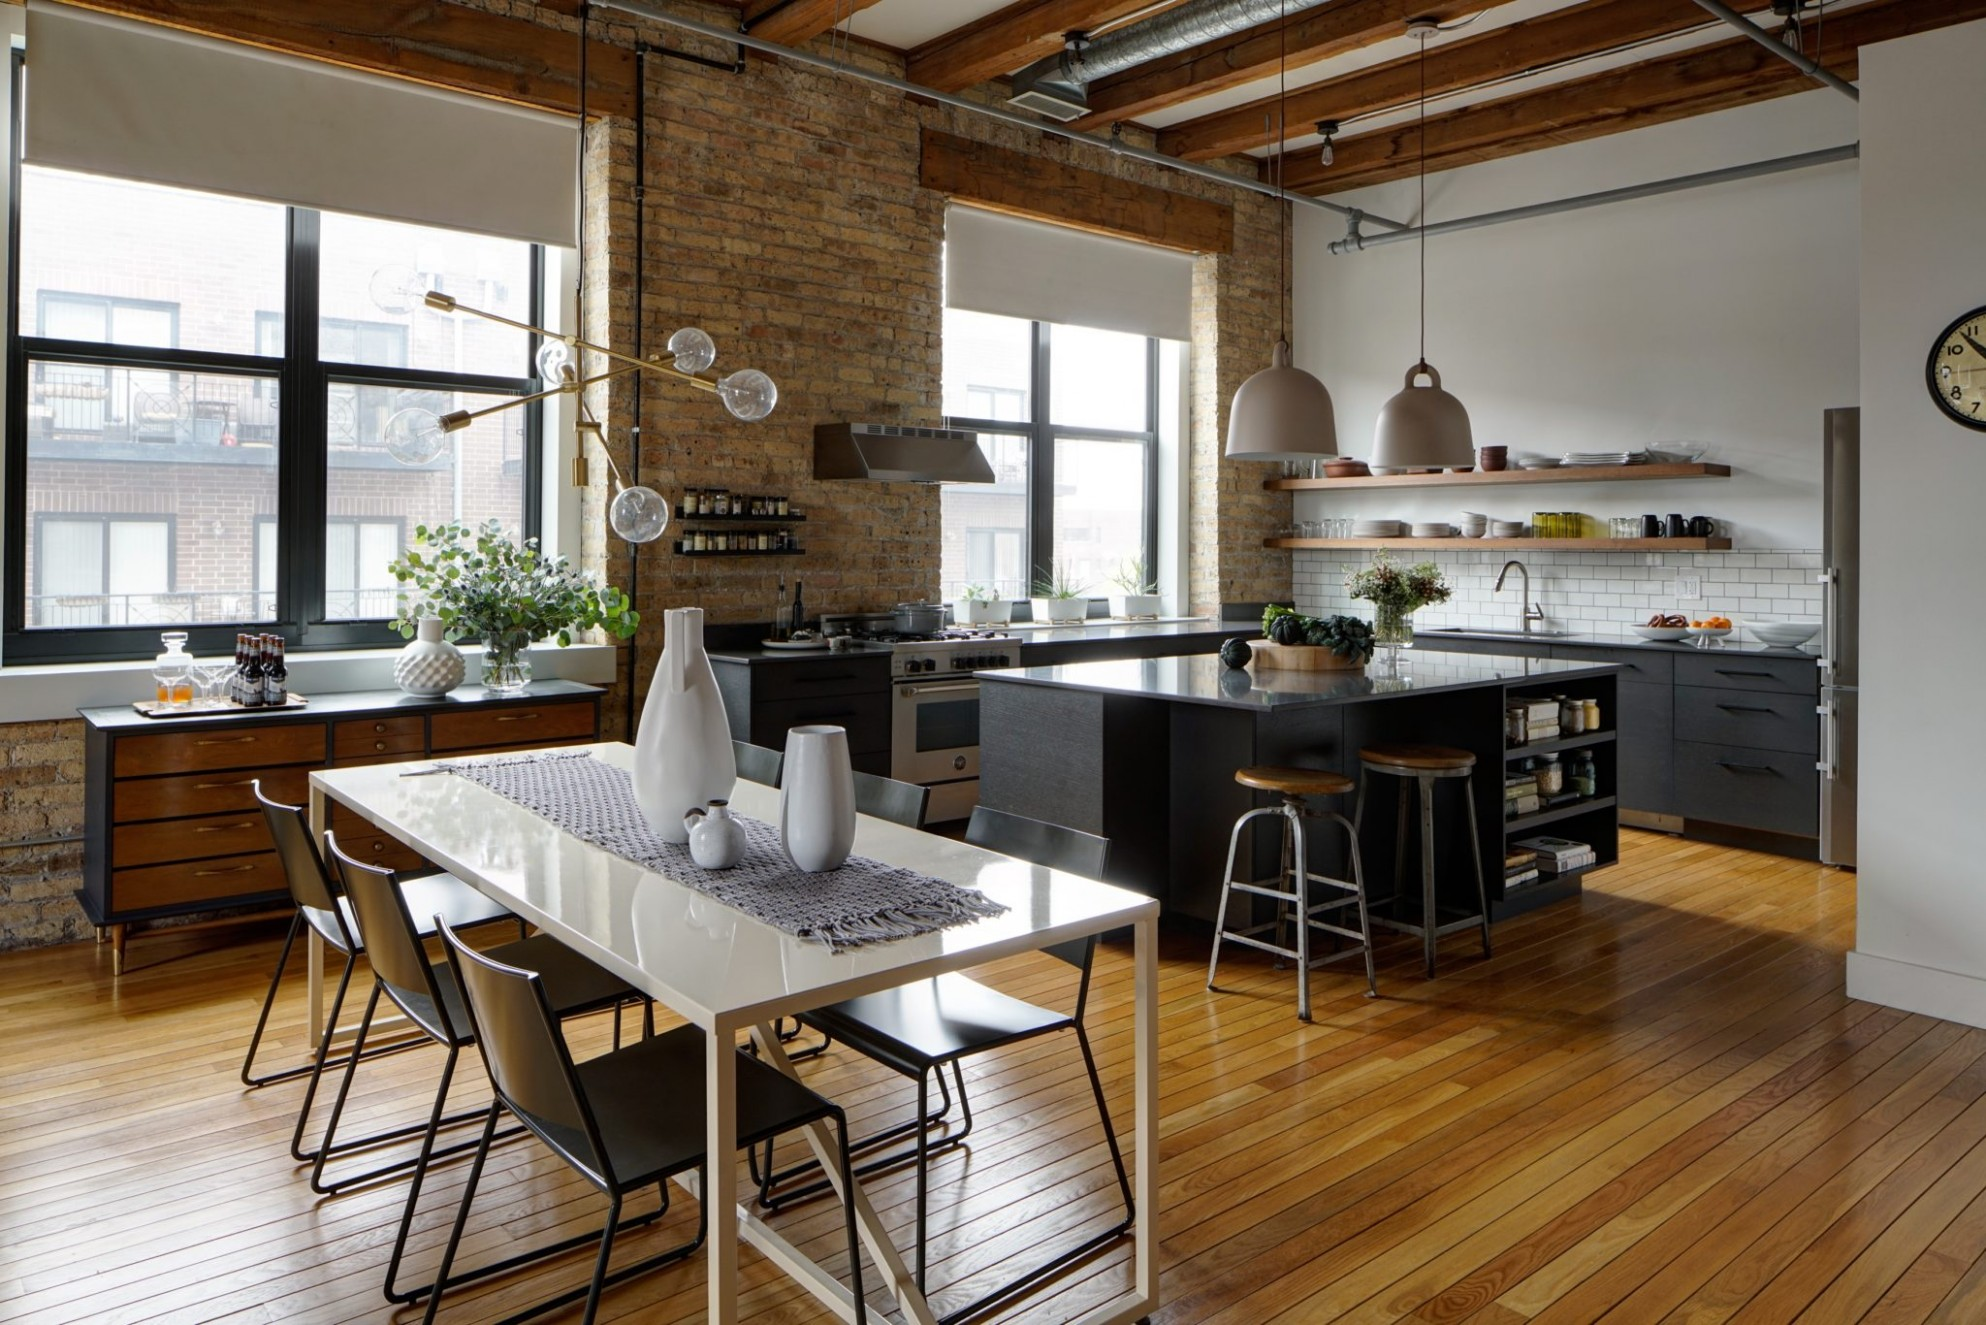 12 Open Kitchen & Dining Areas - Chairish Blog - Dining Room Open To Kitchen Ideas